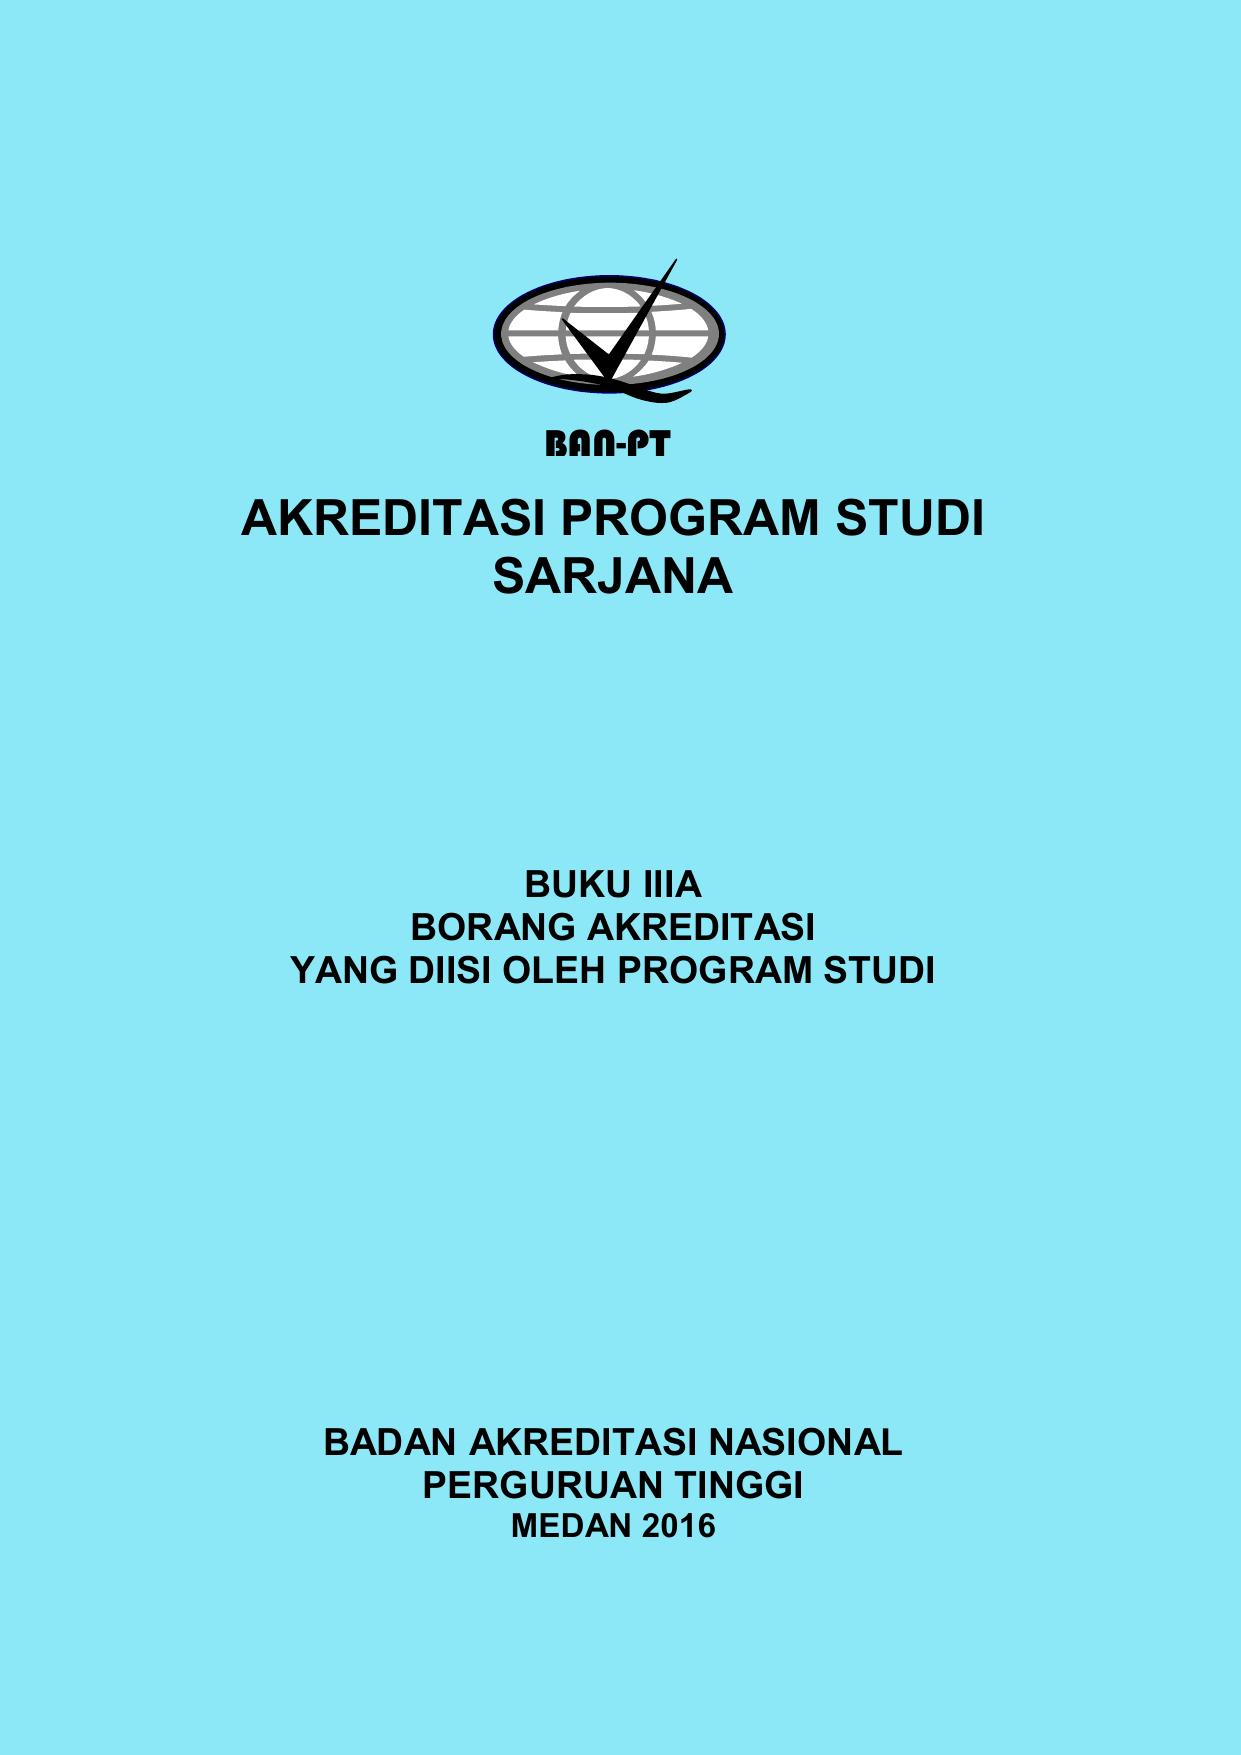 Borang Akreditasi Program Studi 2018 : borang, akreditasi, program, studi, Borang, Akreditasi, PROGRAM, STUDI, ETNOMUSIKOLOGI